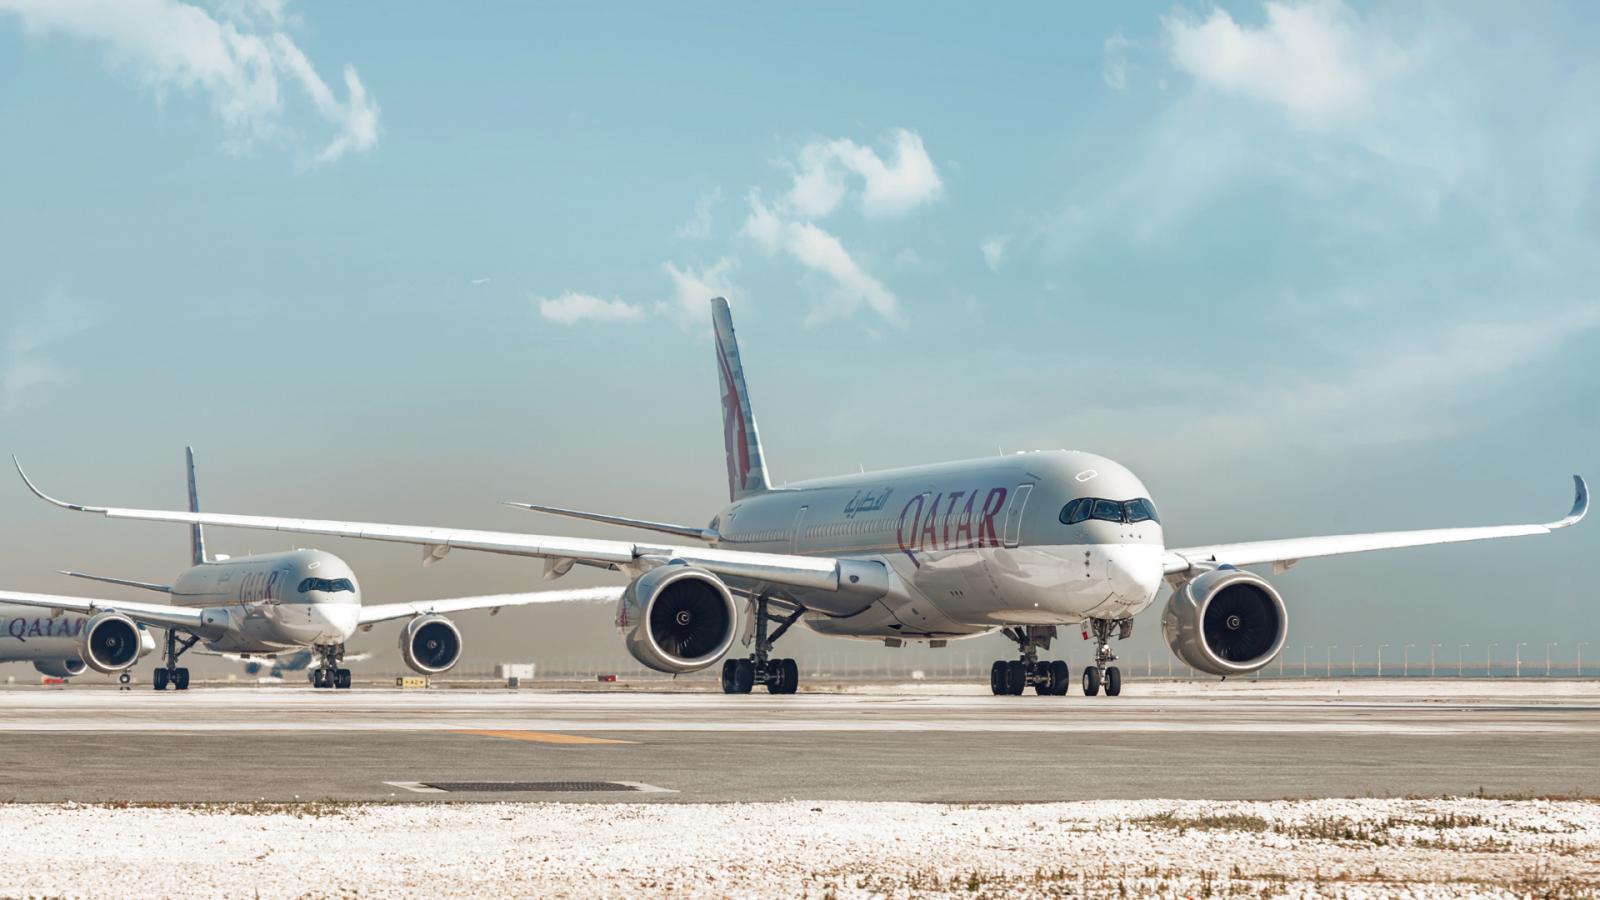 Qatar Airways achieved Diamond Standard in APEX Health Safety Powered by SimpliFlying audit